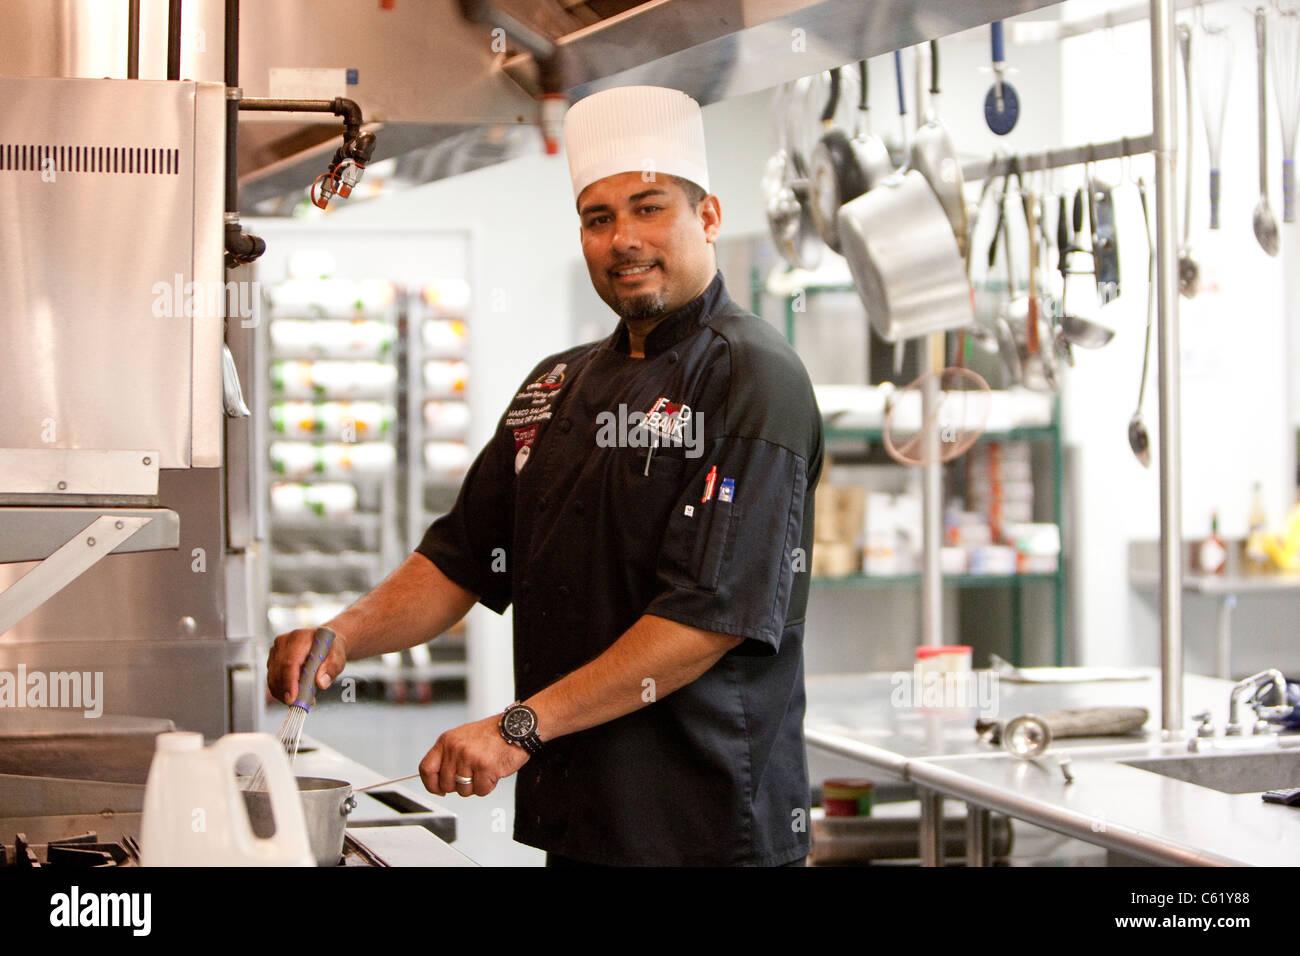 Hispanic male chef works in the kitchen of the San Antonio Food